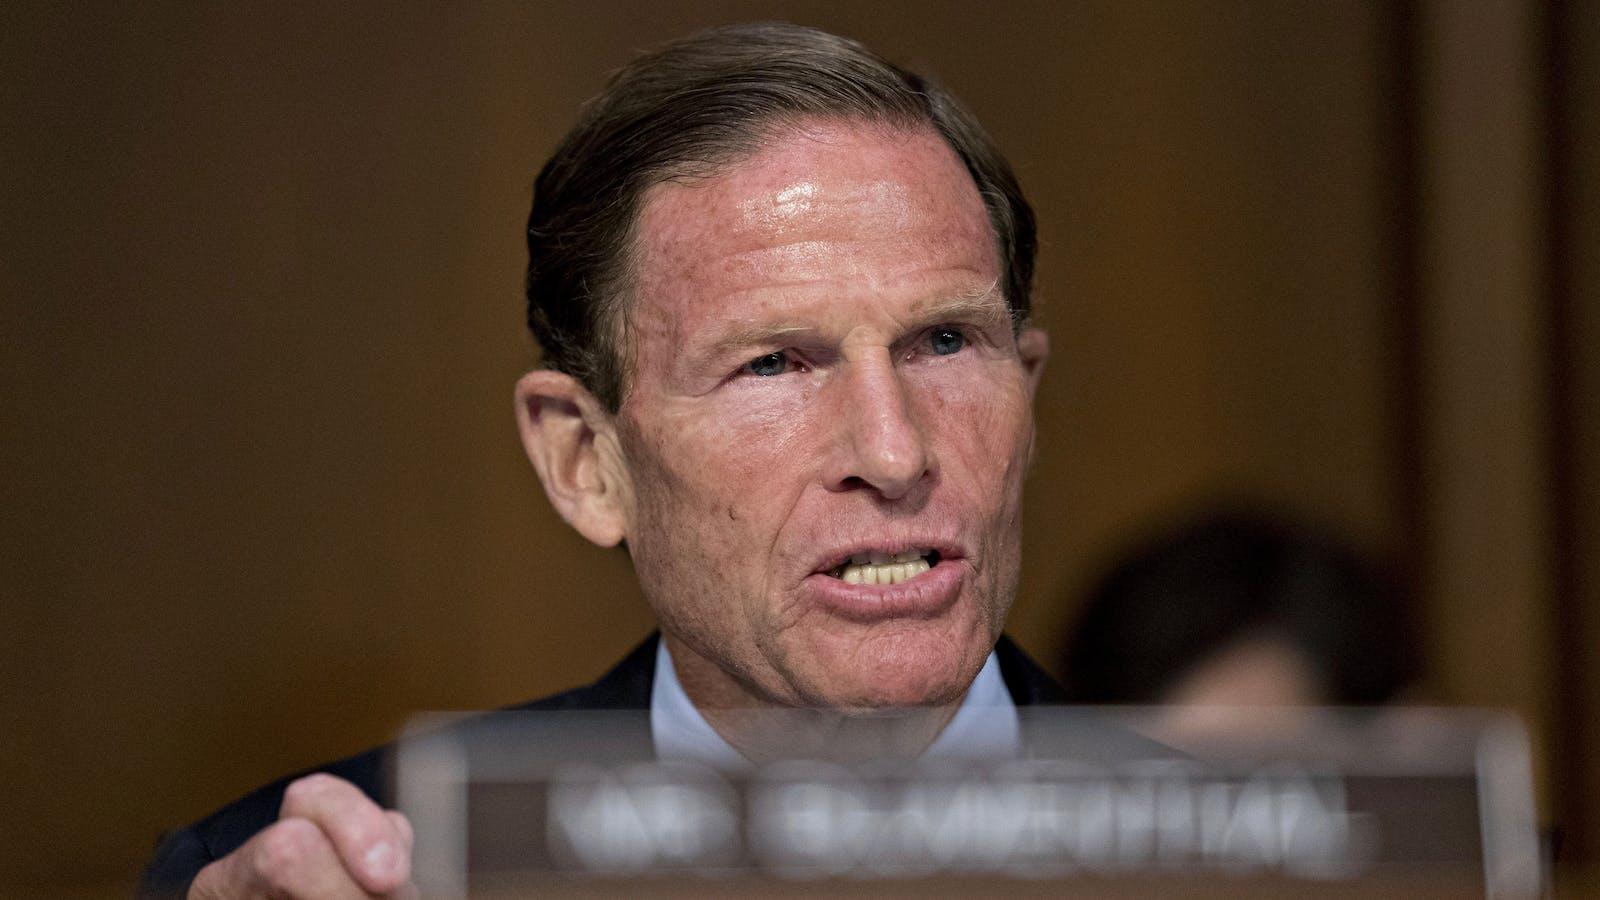 Sen. Richard Blumenthal. Photo by Bloomberg